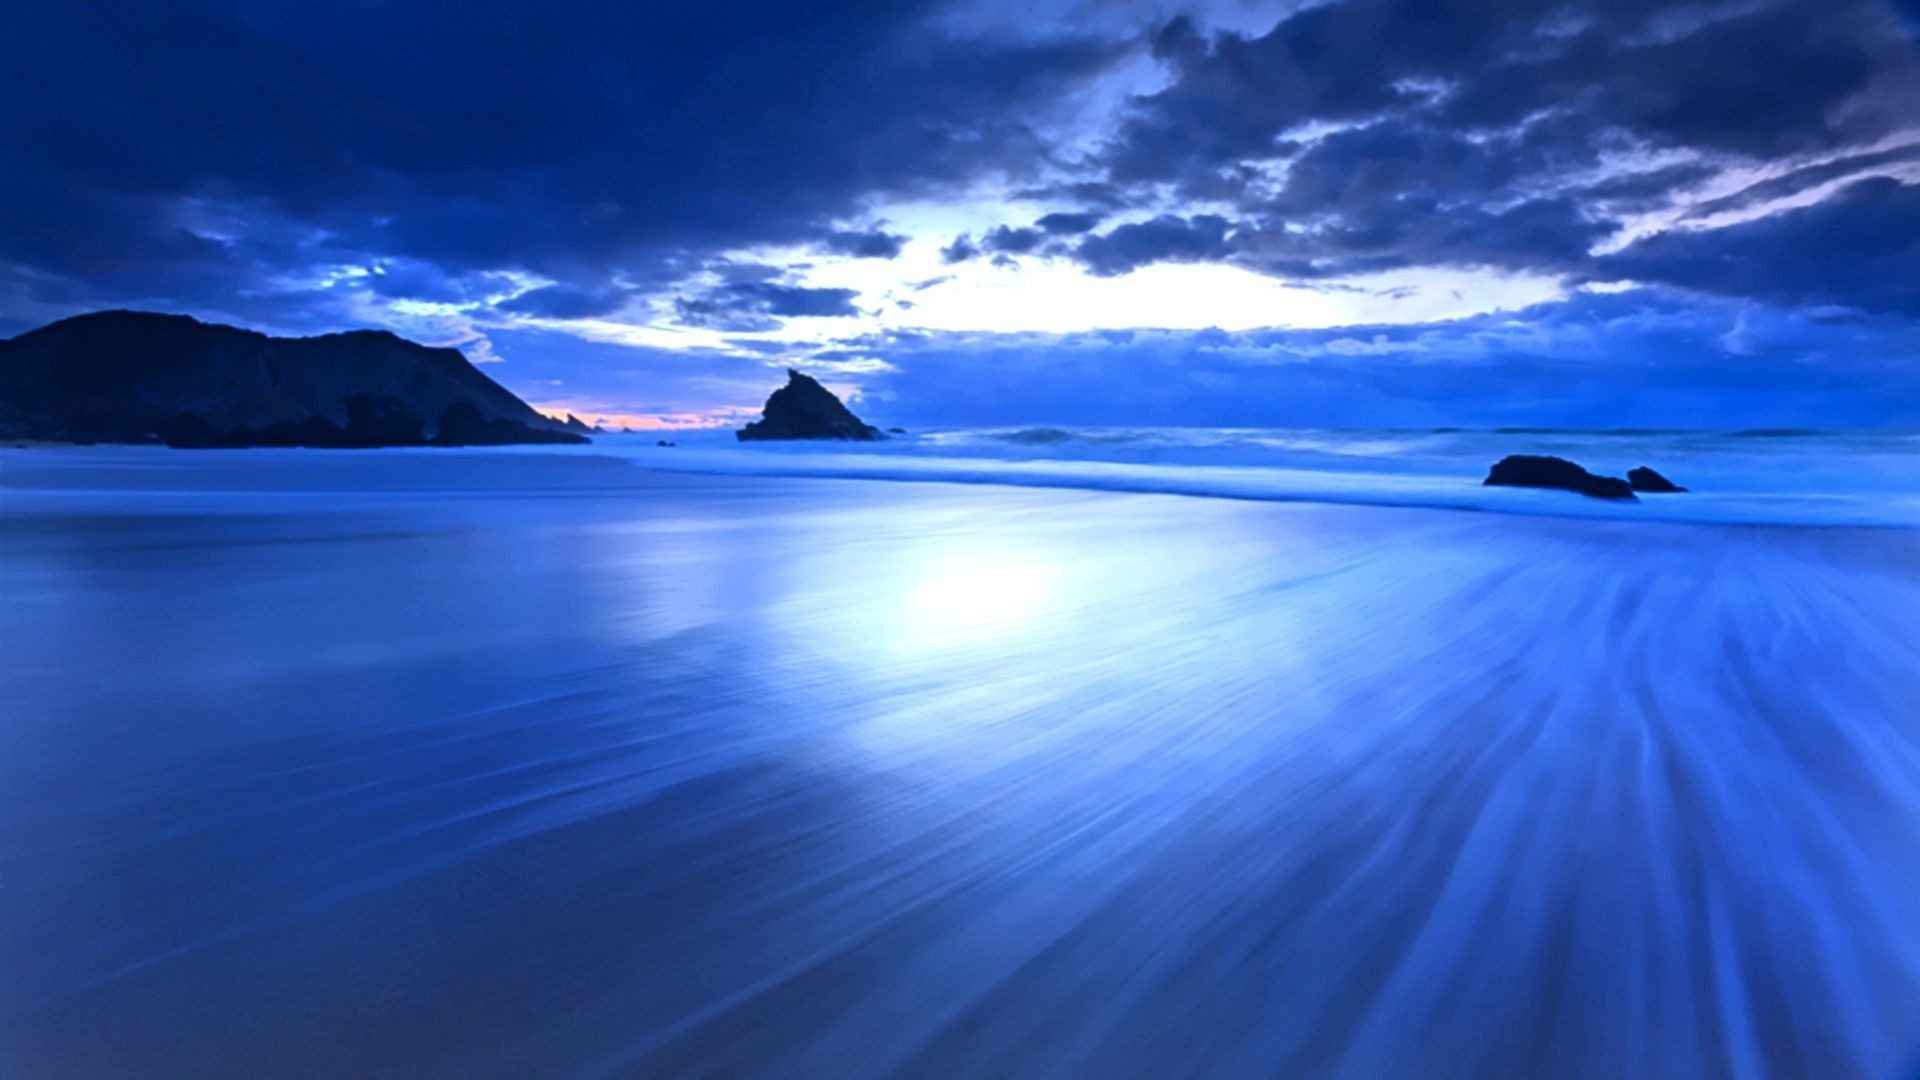 Blue Ocean Wallpaper HD